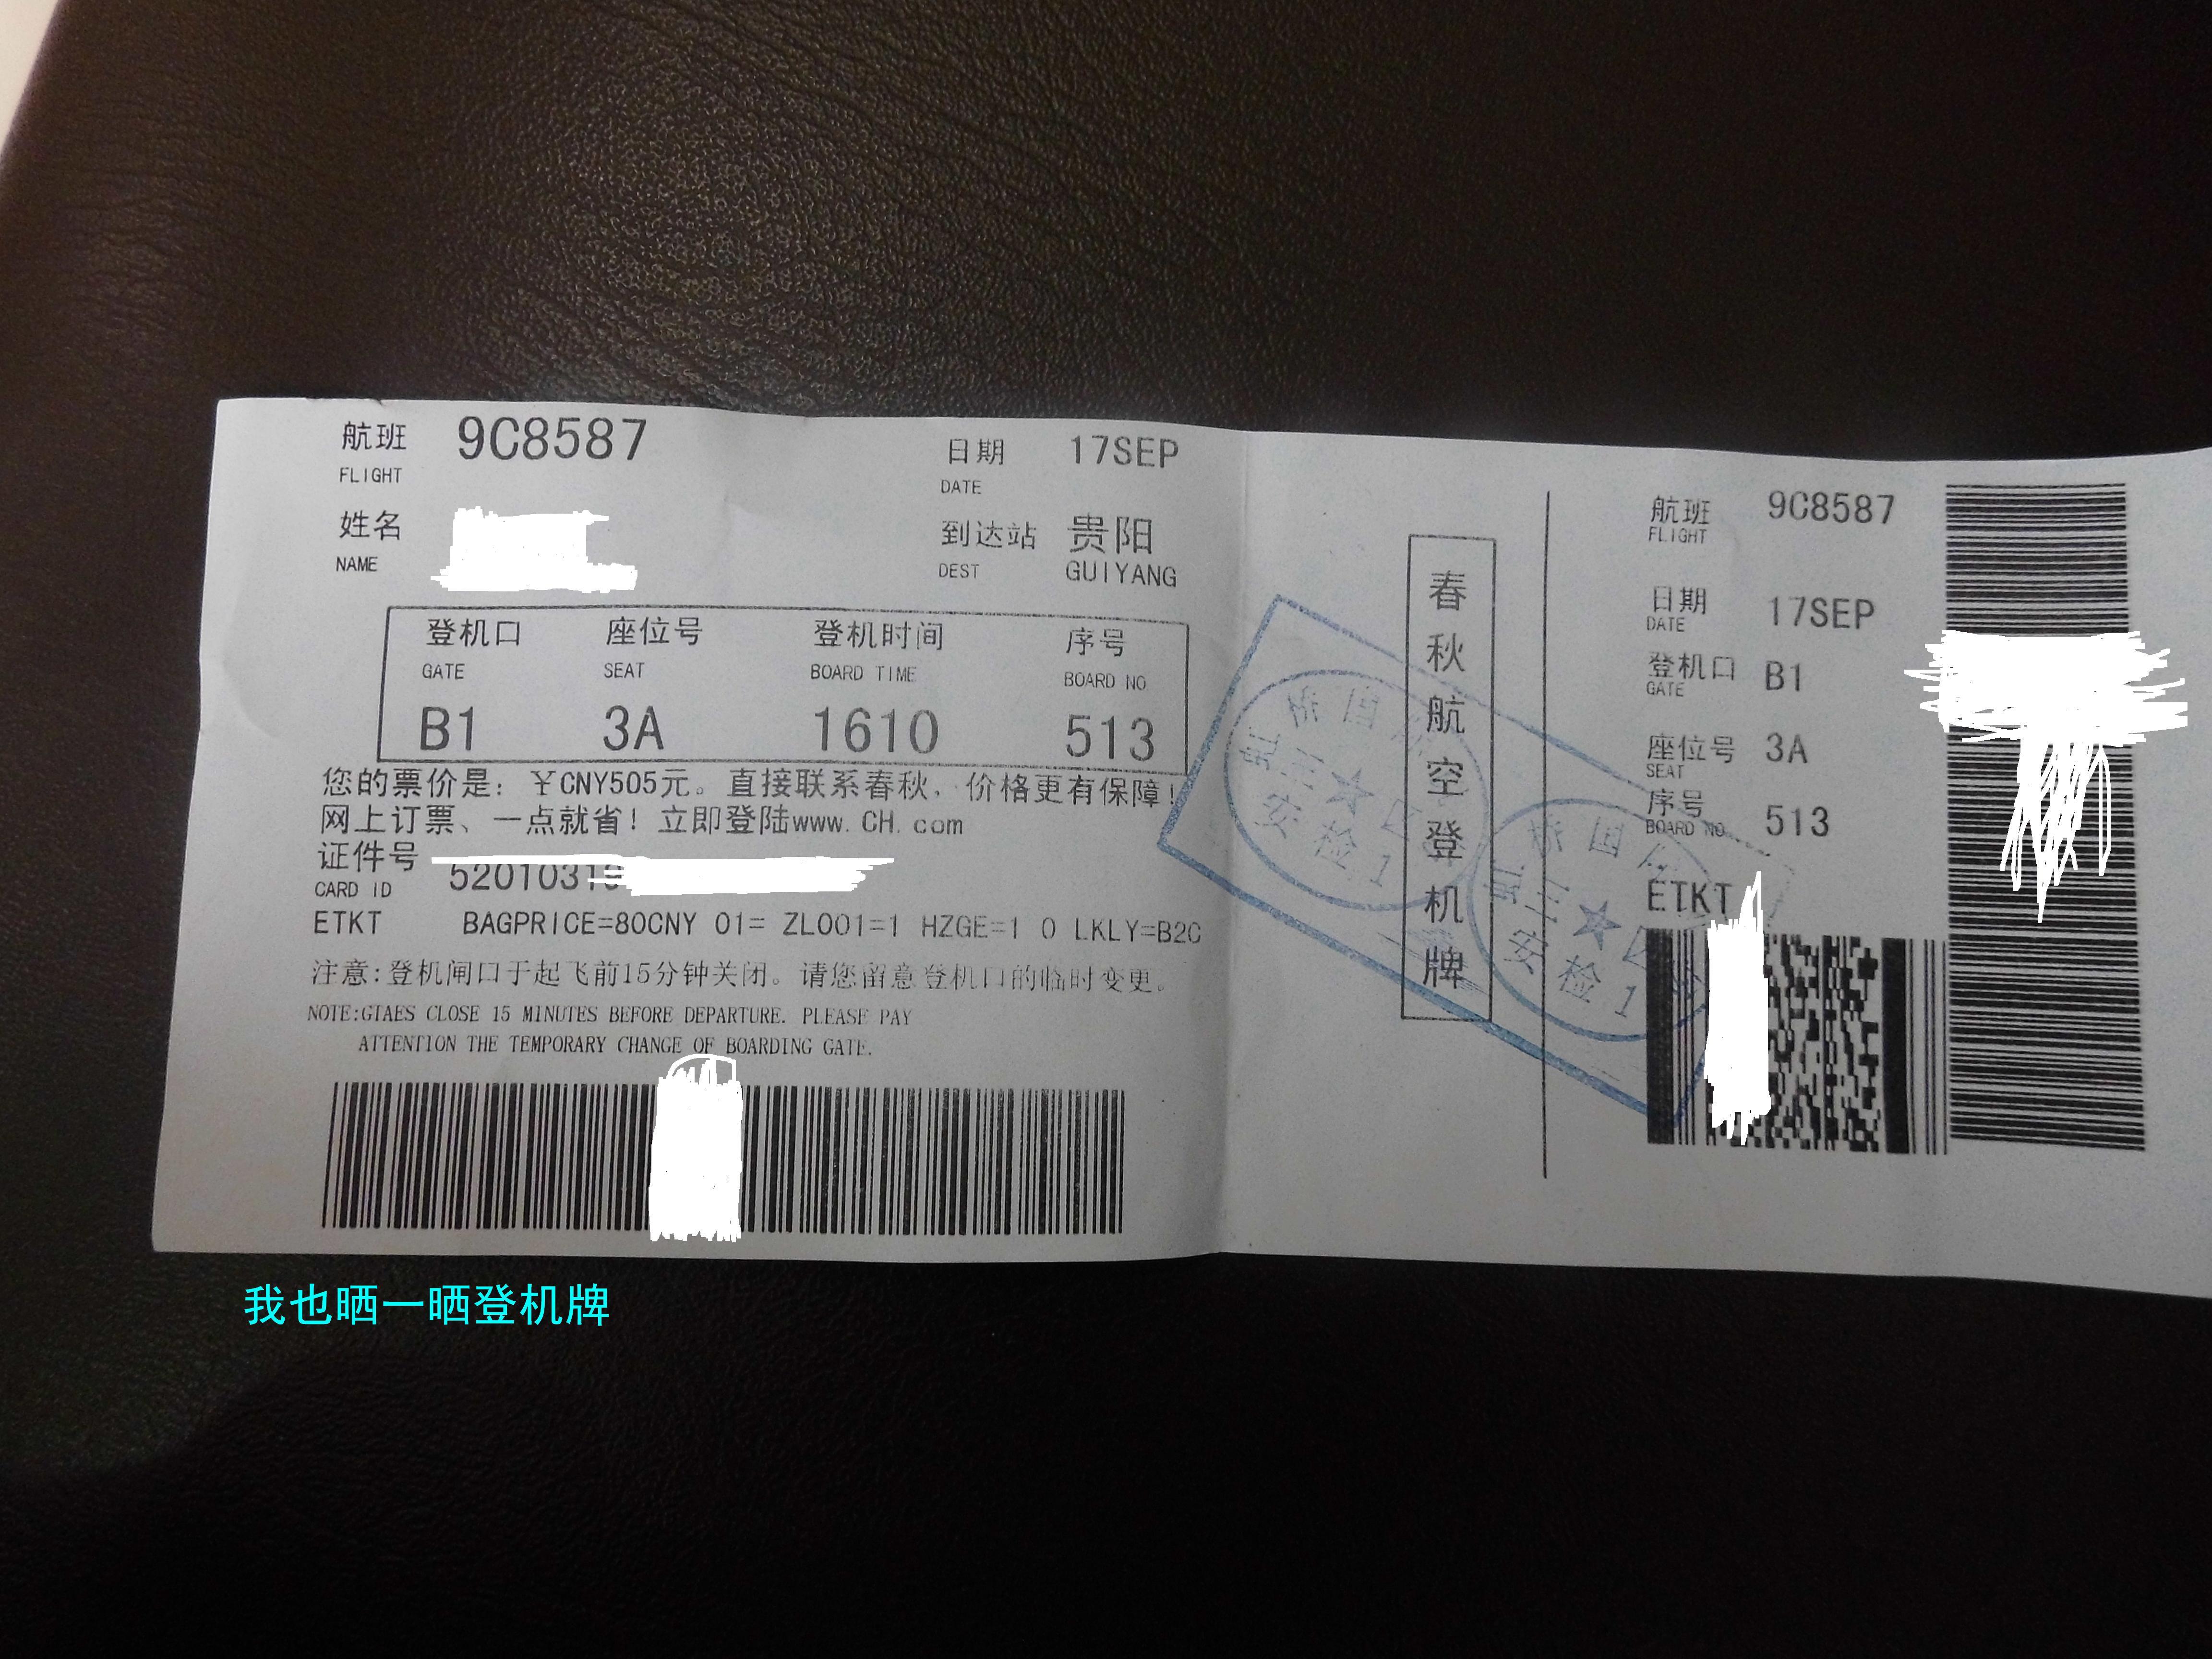 Re:[原创]新手第一帖(送女儿上大学)照片太大不知道怎样缩小,请各位看官自己缩小到25%欣赏    中国上海虹桥国际机场